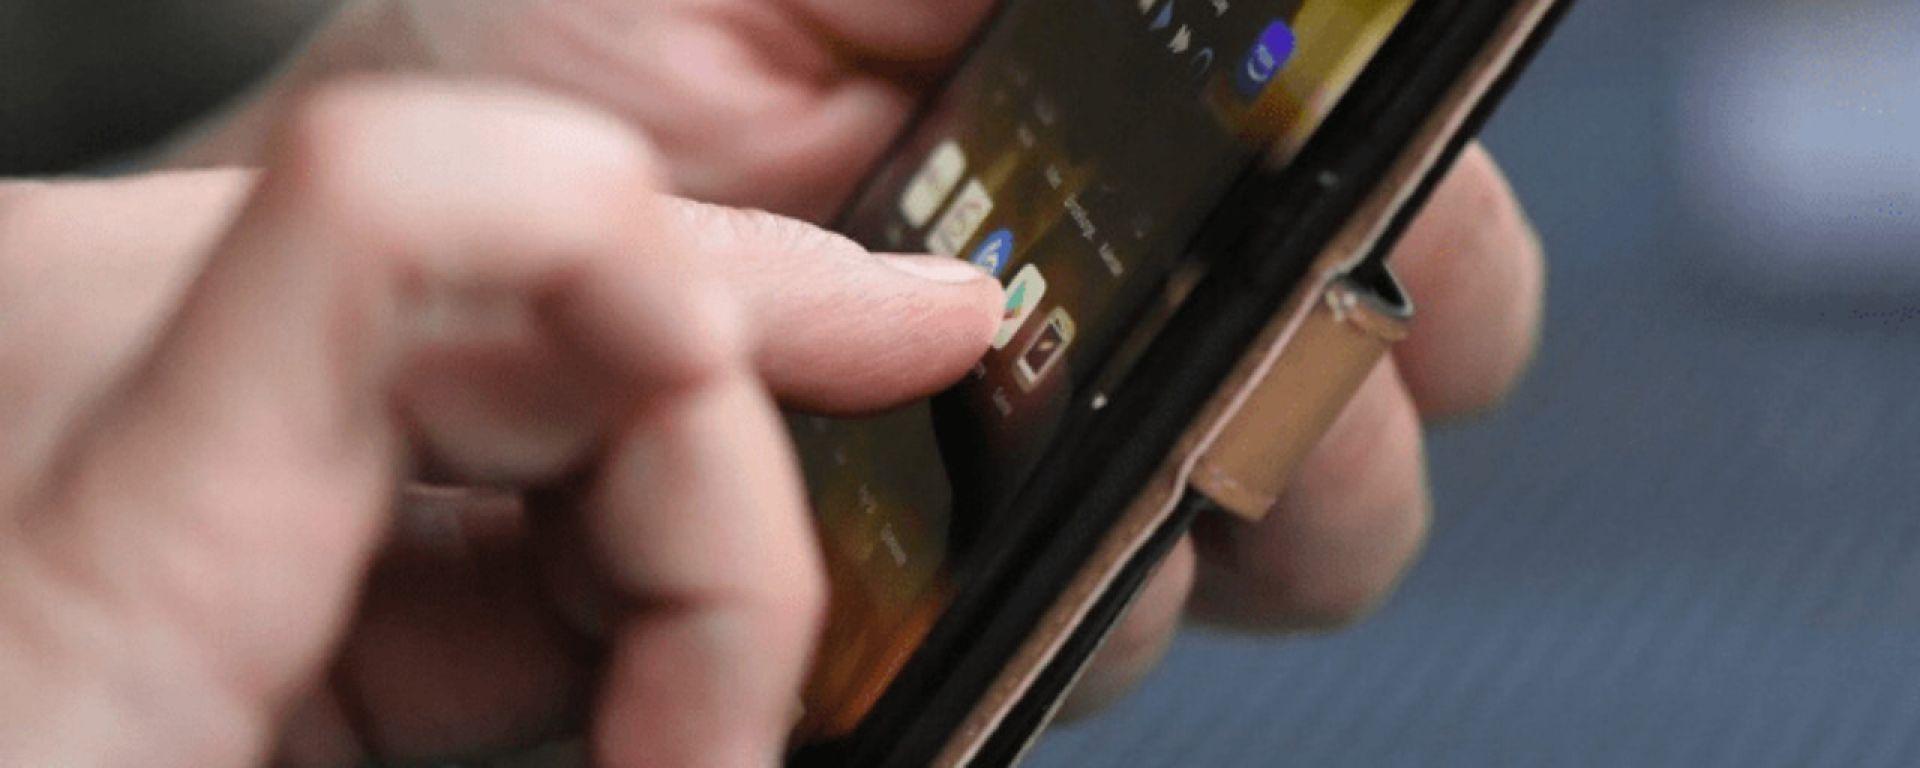 Autocertificazione spostamenti, l'app per smartphone non è valida